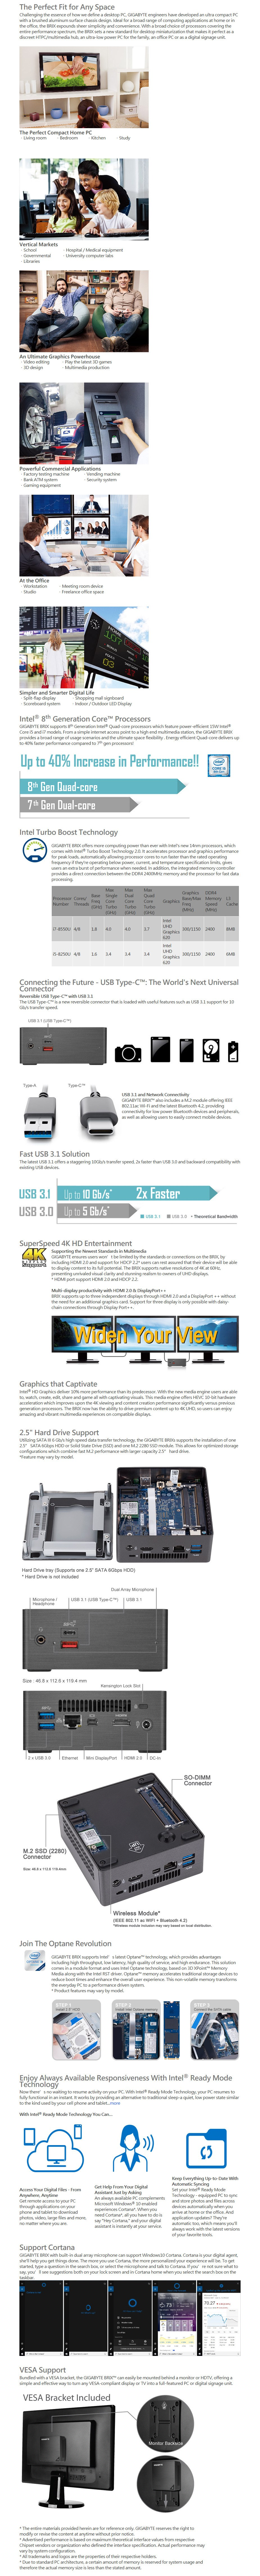 Gigabyte Brix GB-BRi5H-8250 Barebone Kit - Intel i5 8th Gen Processor - Desktop Overview 1